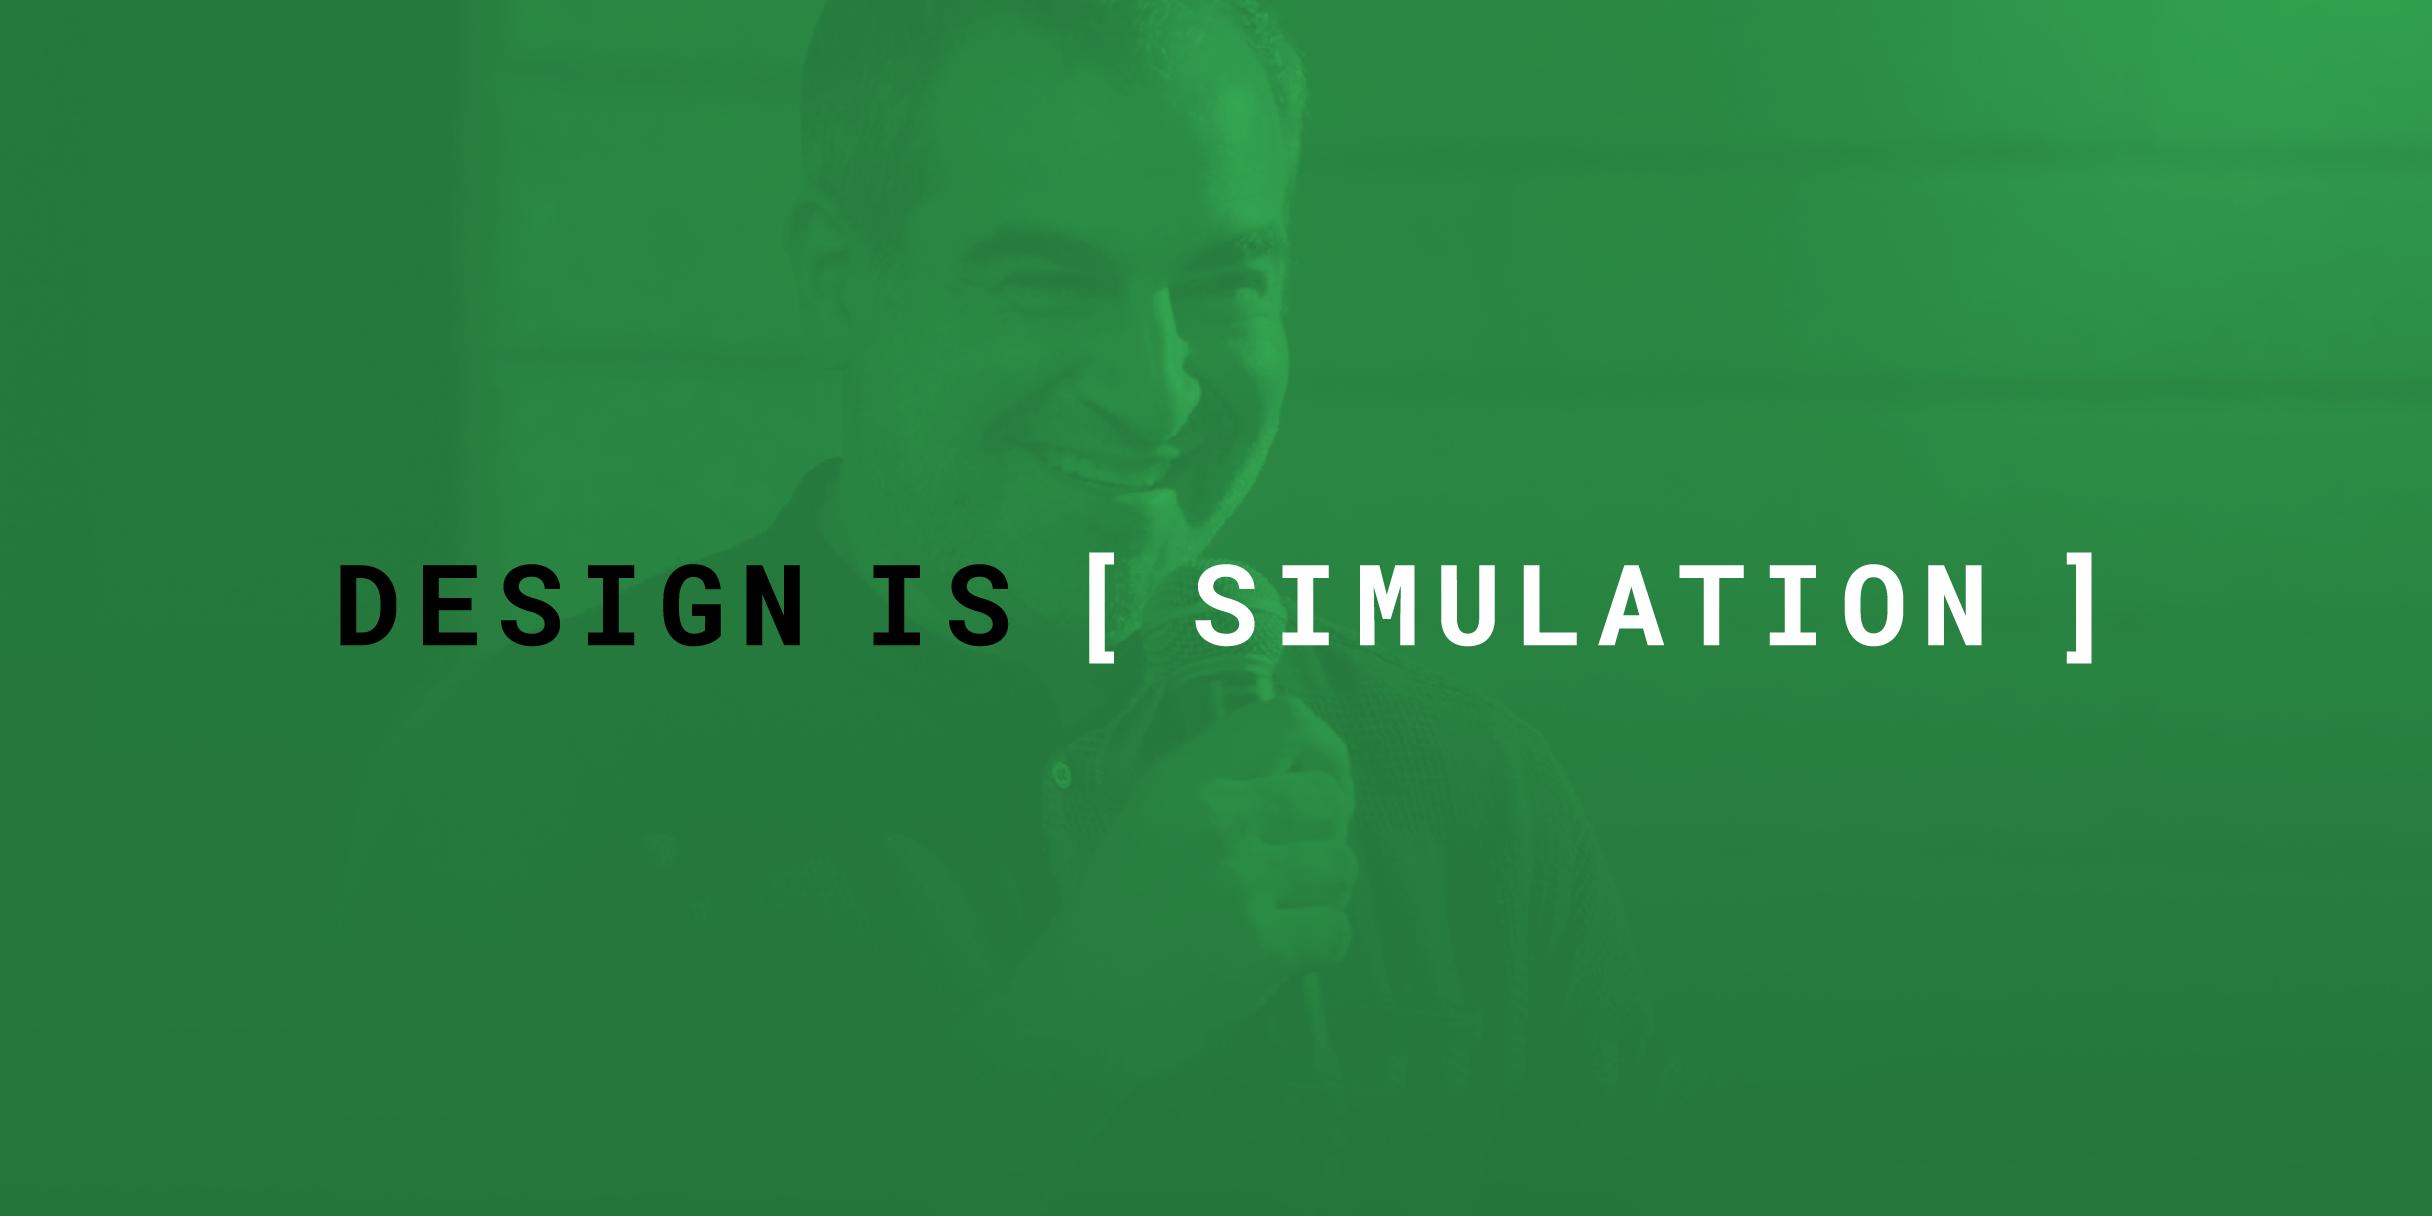 design_is_simulation_2x1